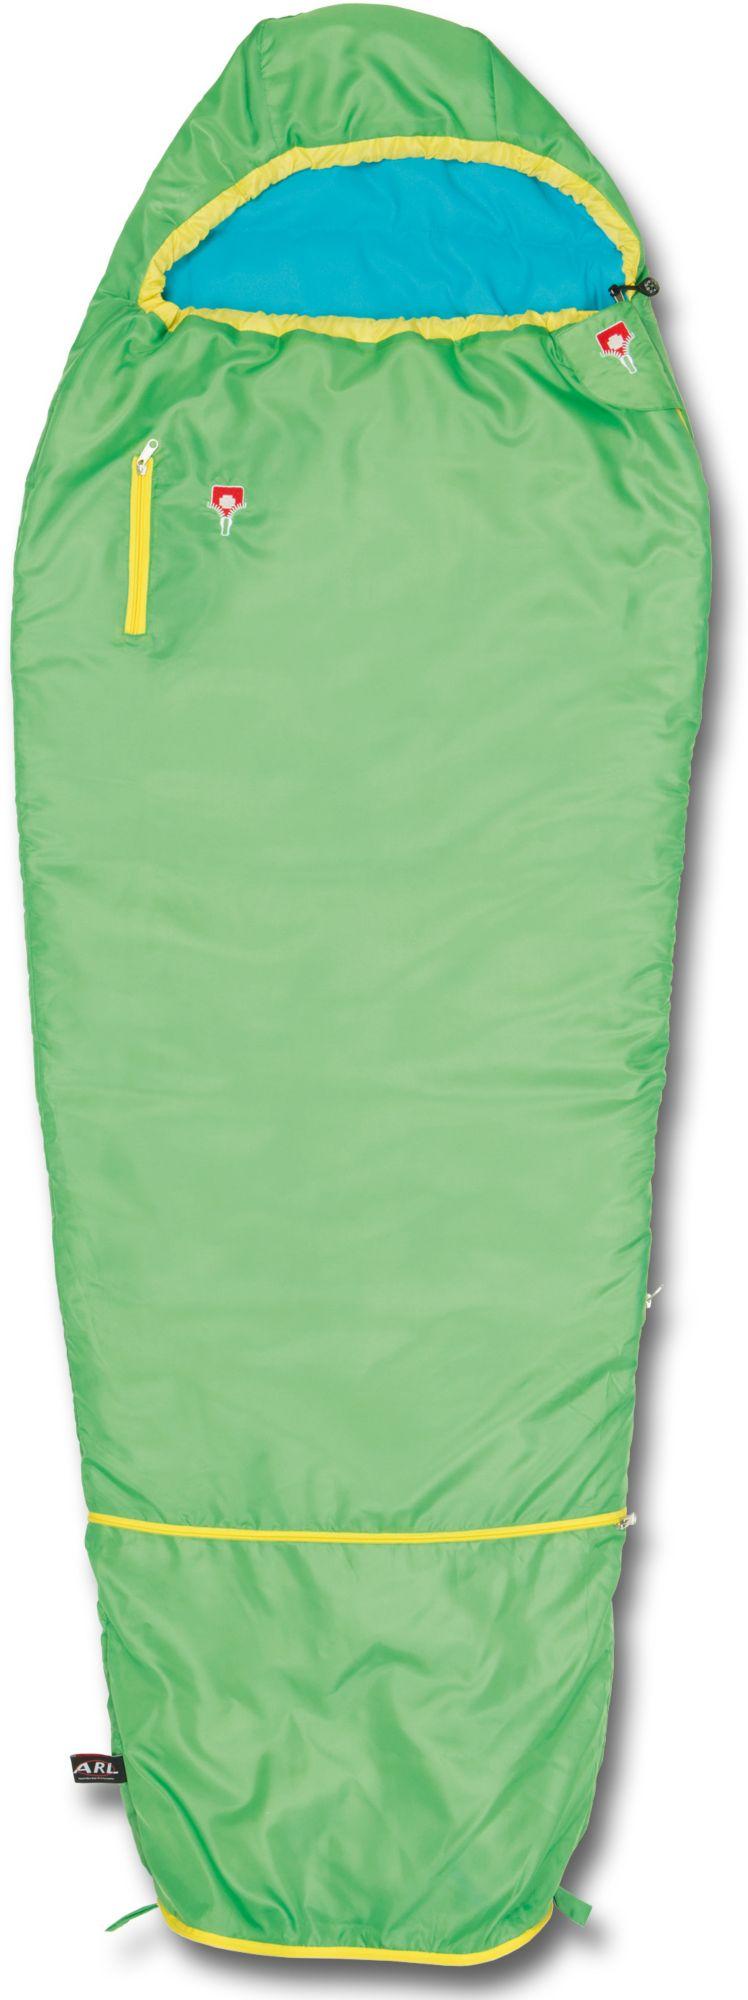 GRÜEZI BAG Grüezi bag Kinderschlafsack, »KIDS GROW«